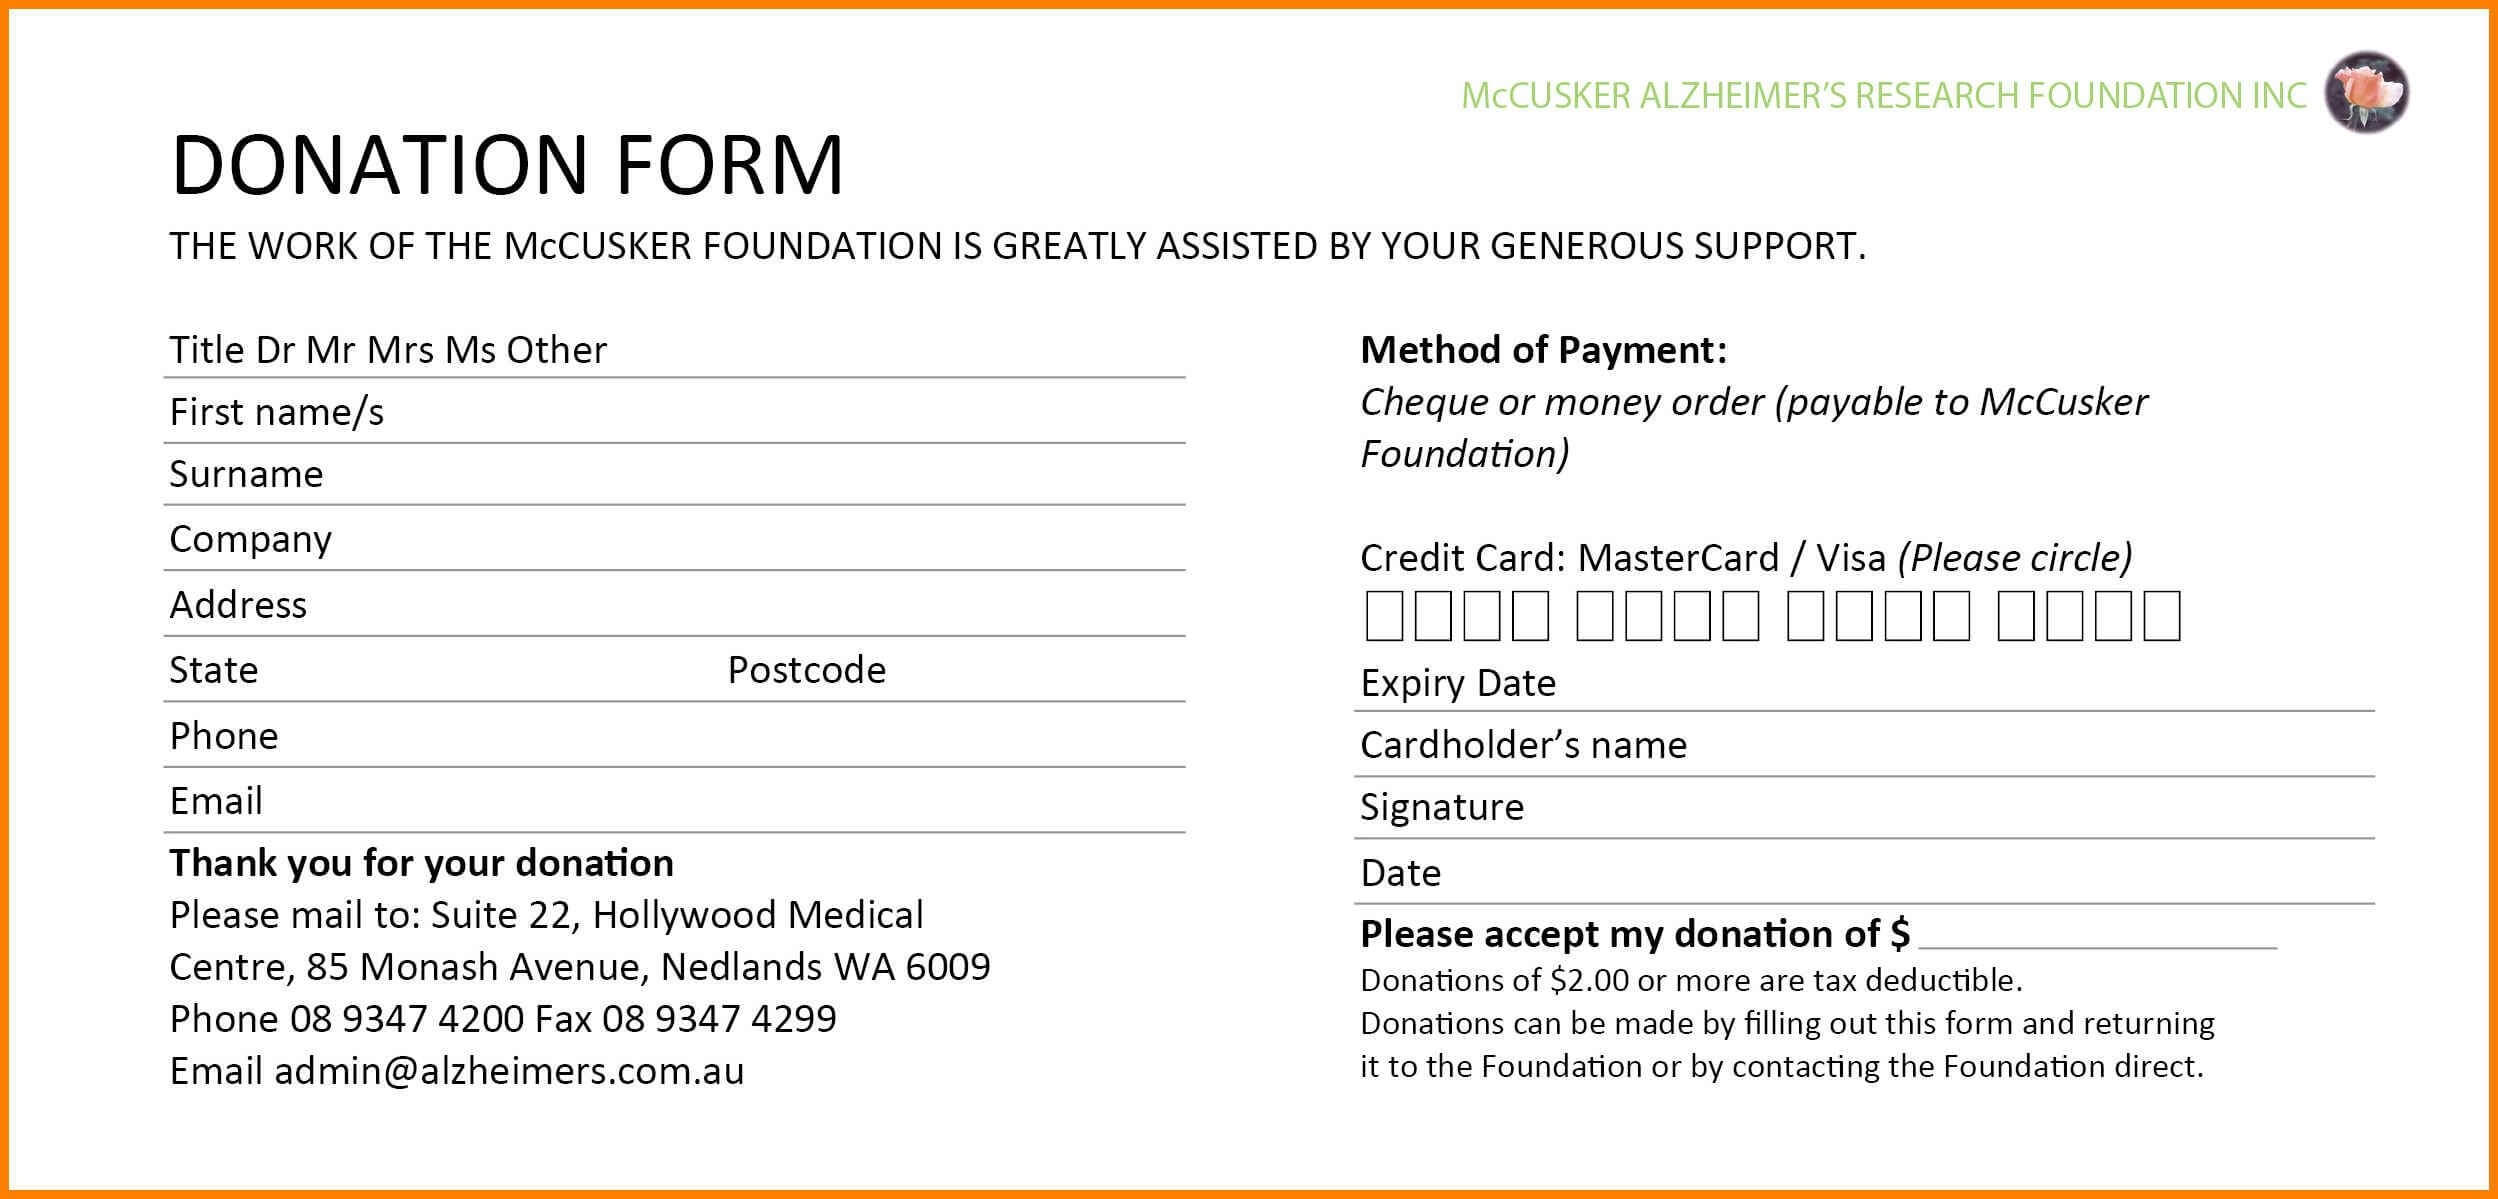 donation pledge card template - Ficim Pertaining To Fundraising Pledge Card Template